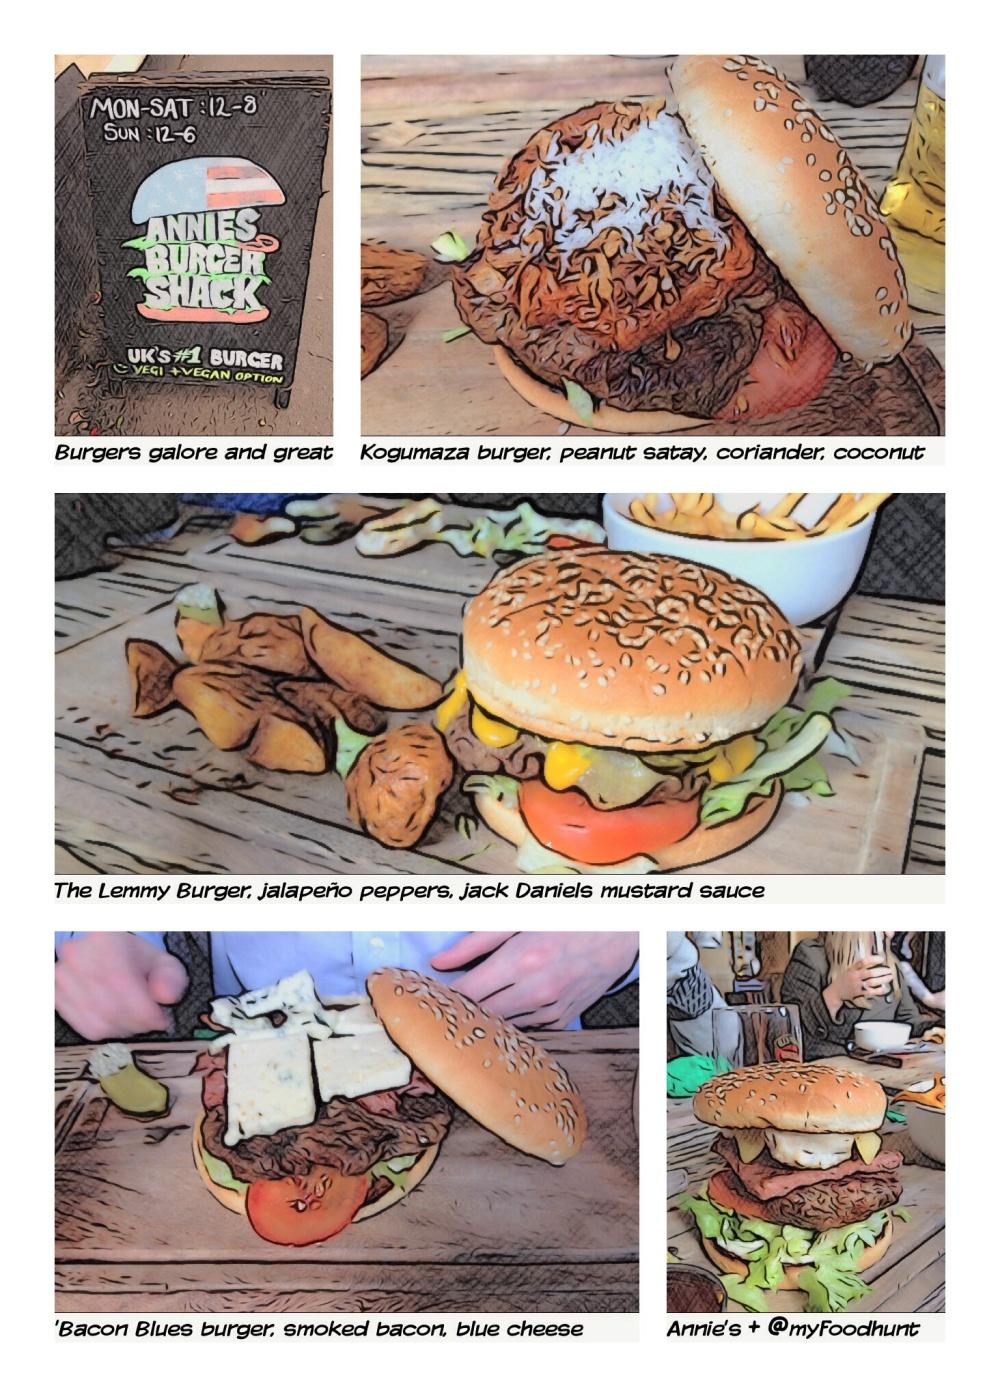 Annies burger shack comic